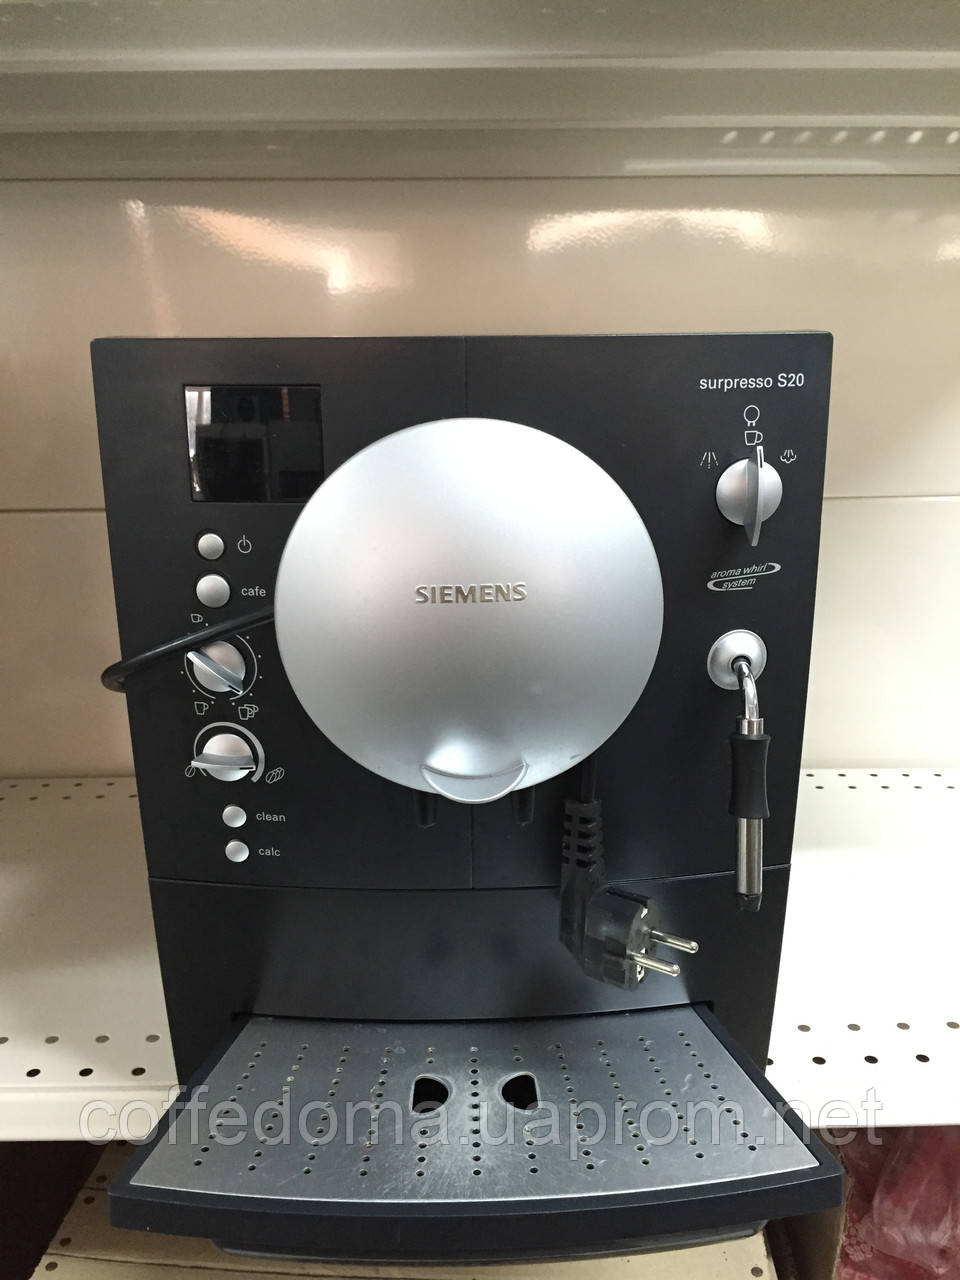 Siemens Surpresso S20 автоматическая кофемашина